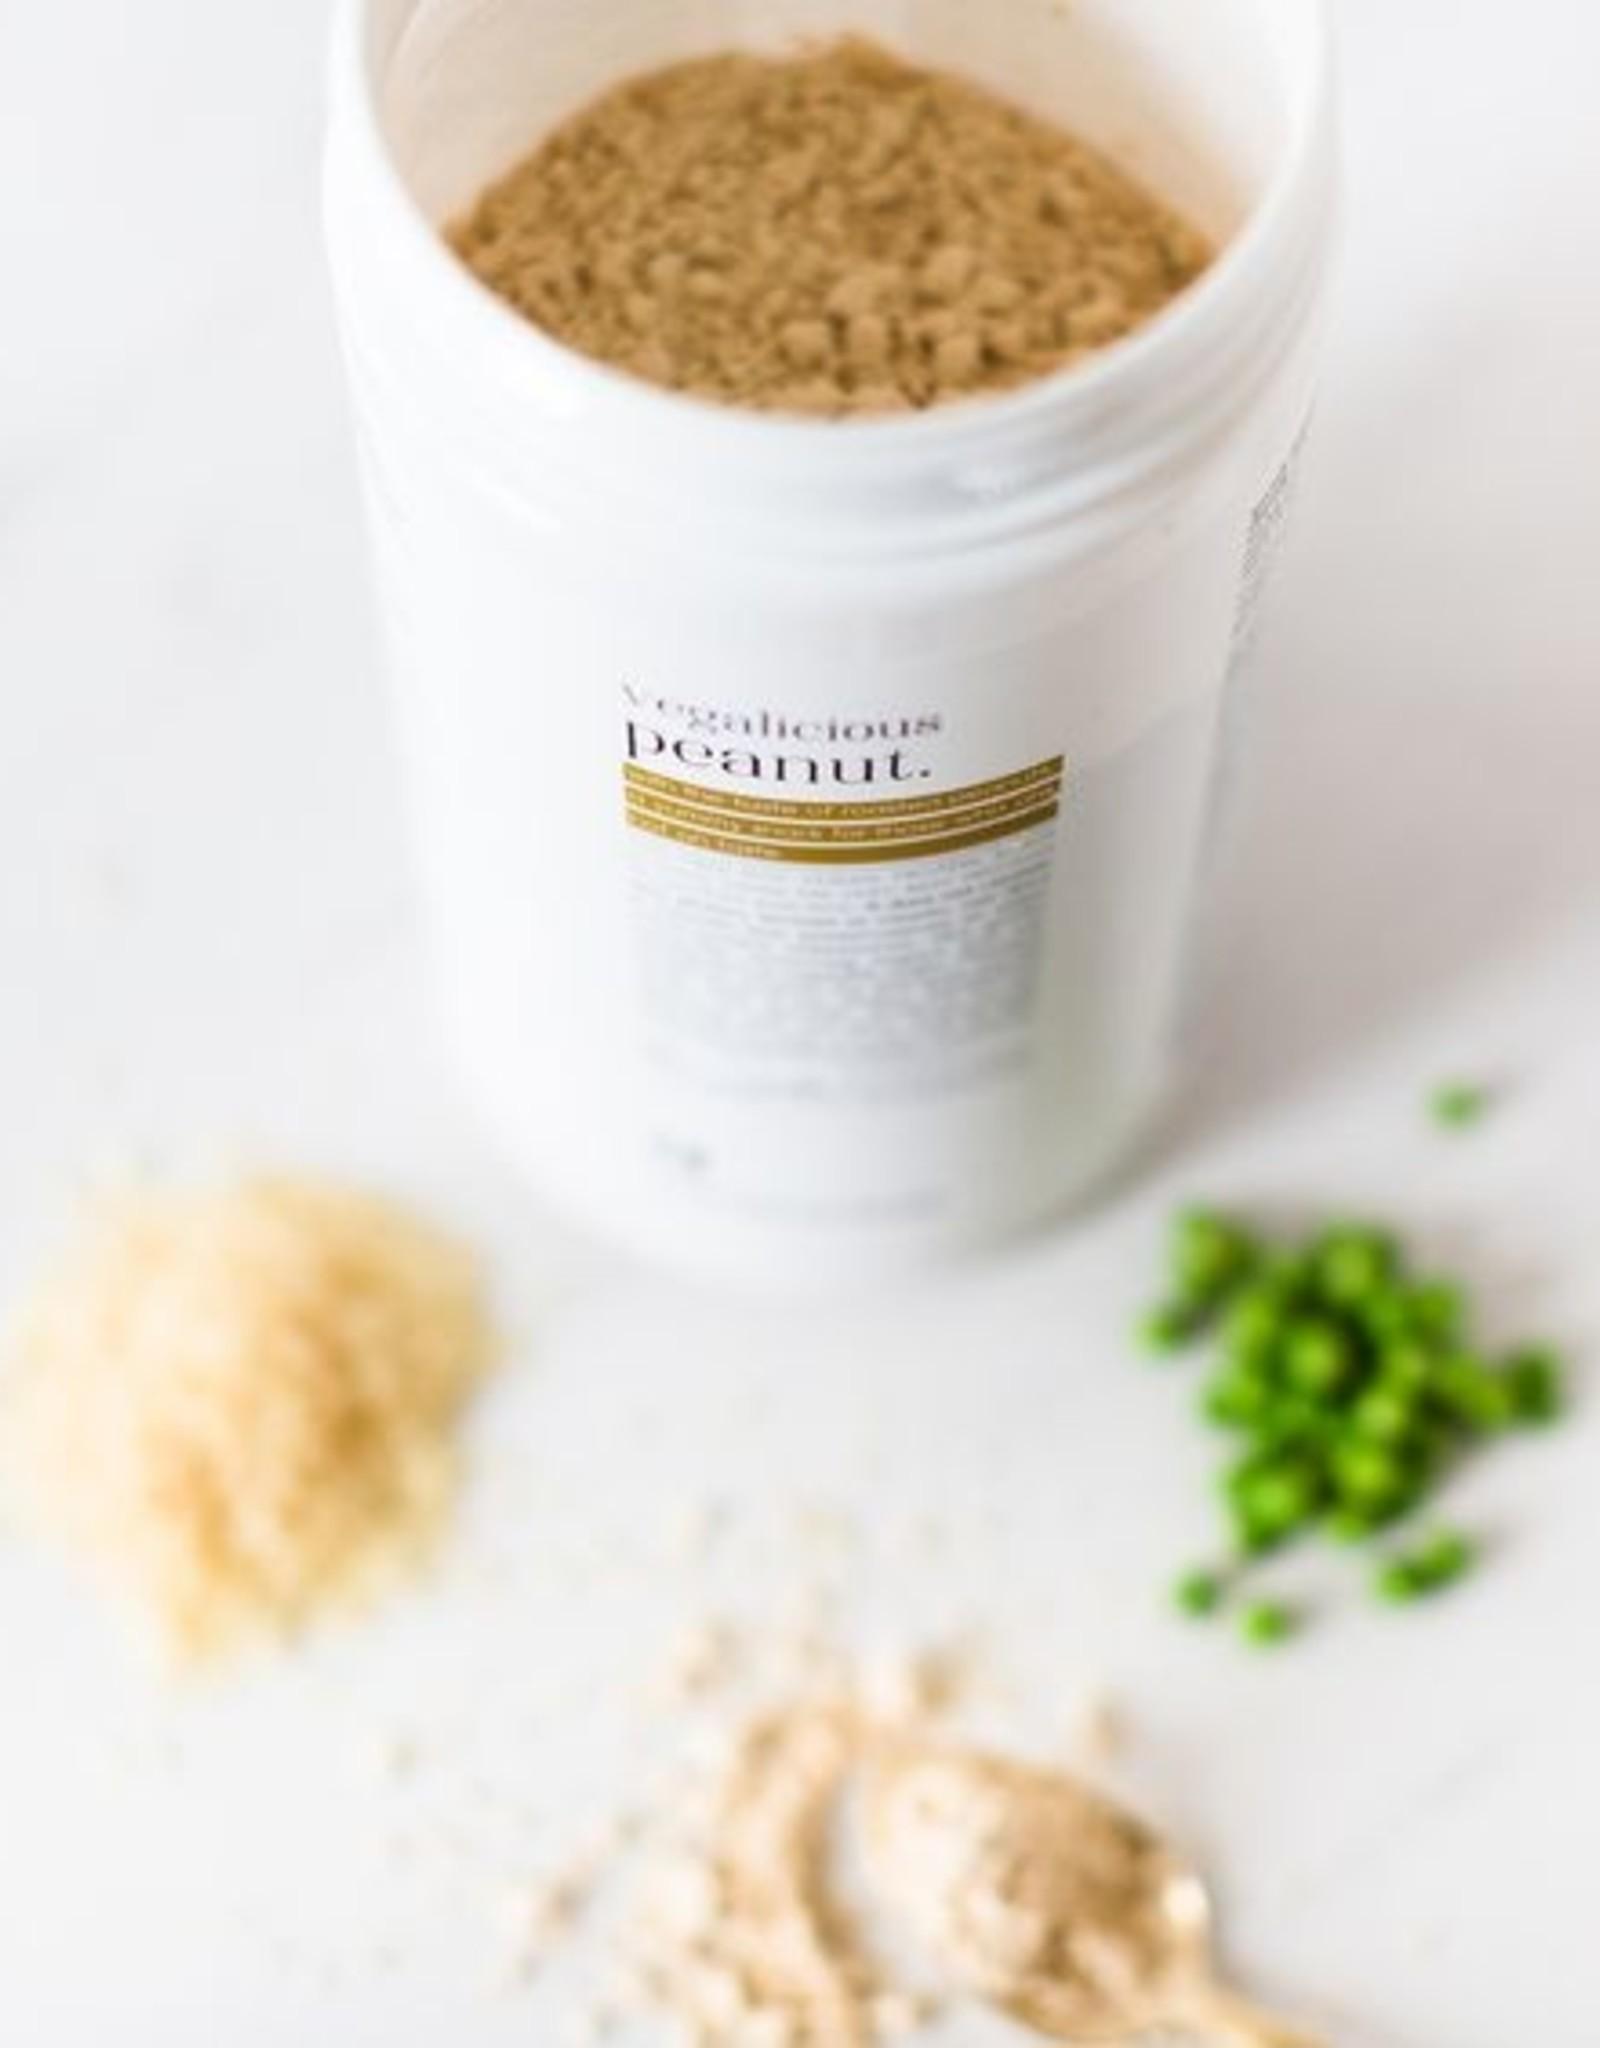 RainPharma Rainpharma - Vegalicious Peanut